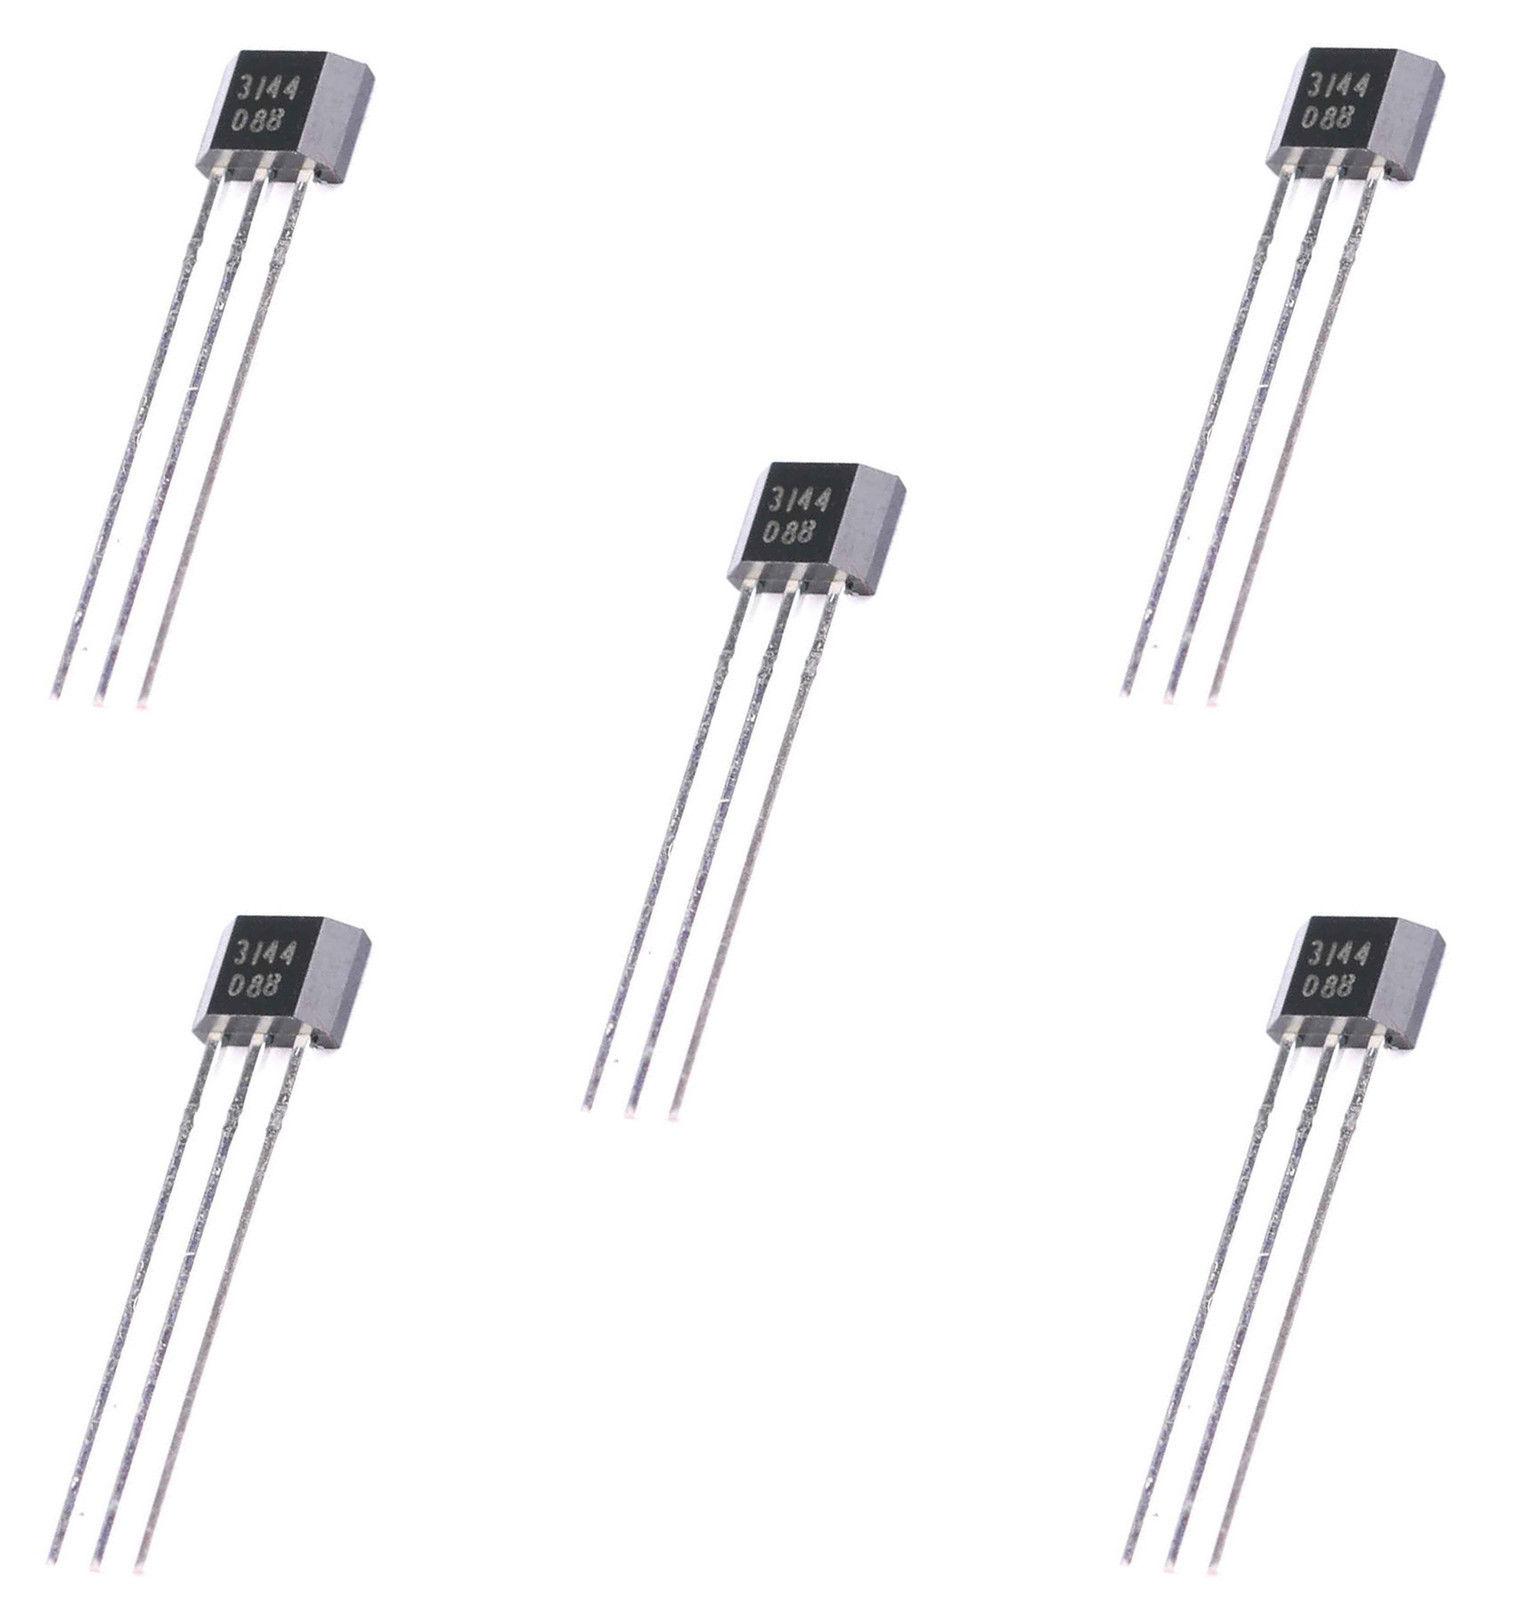 5 x a3144 hall effect sensor switch